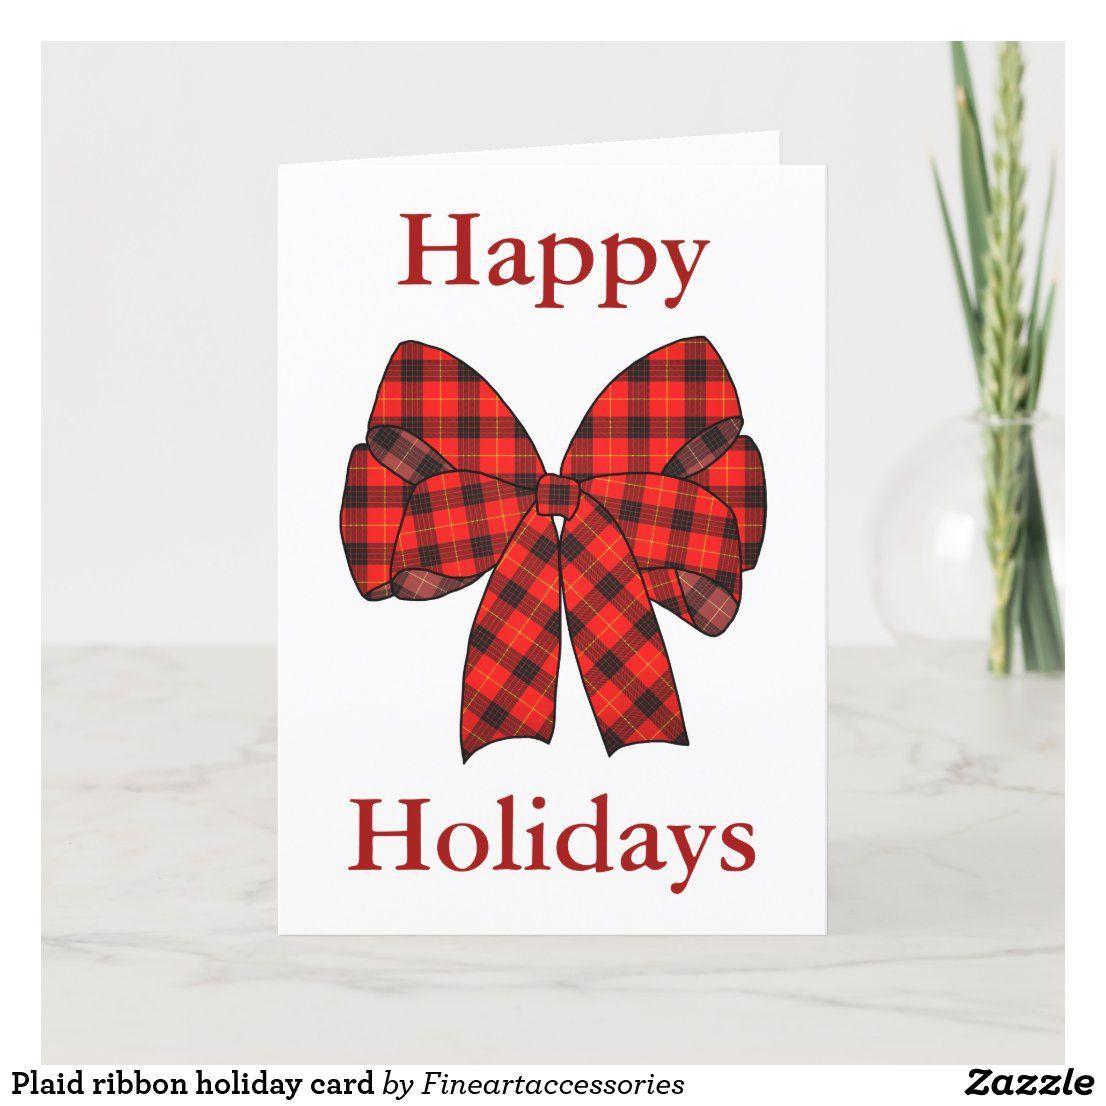 Plaid ribbon holiday card 30% off with code MONDAYTREATS #invitations #holiday #party #christmas #Greetingcards #cards #bow #plaid #tartan #ribbon